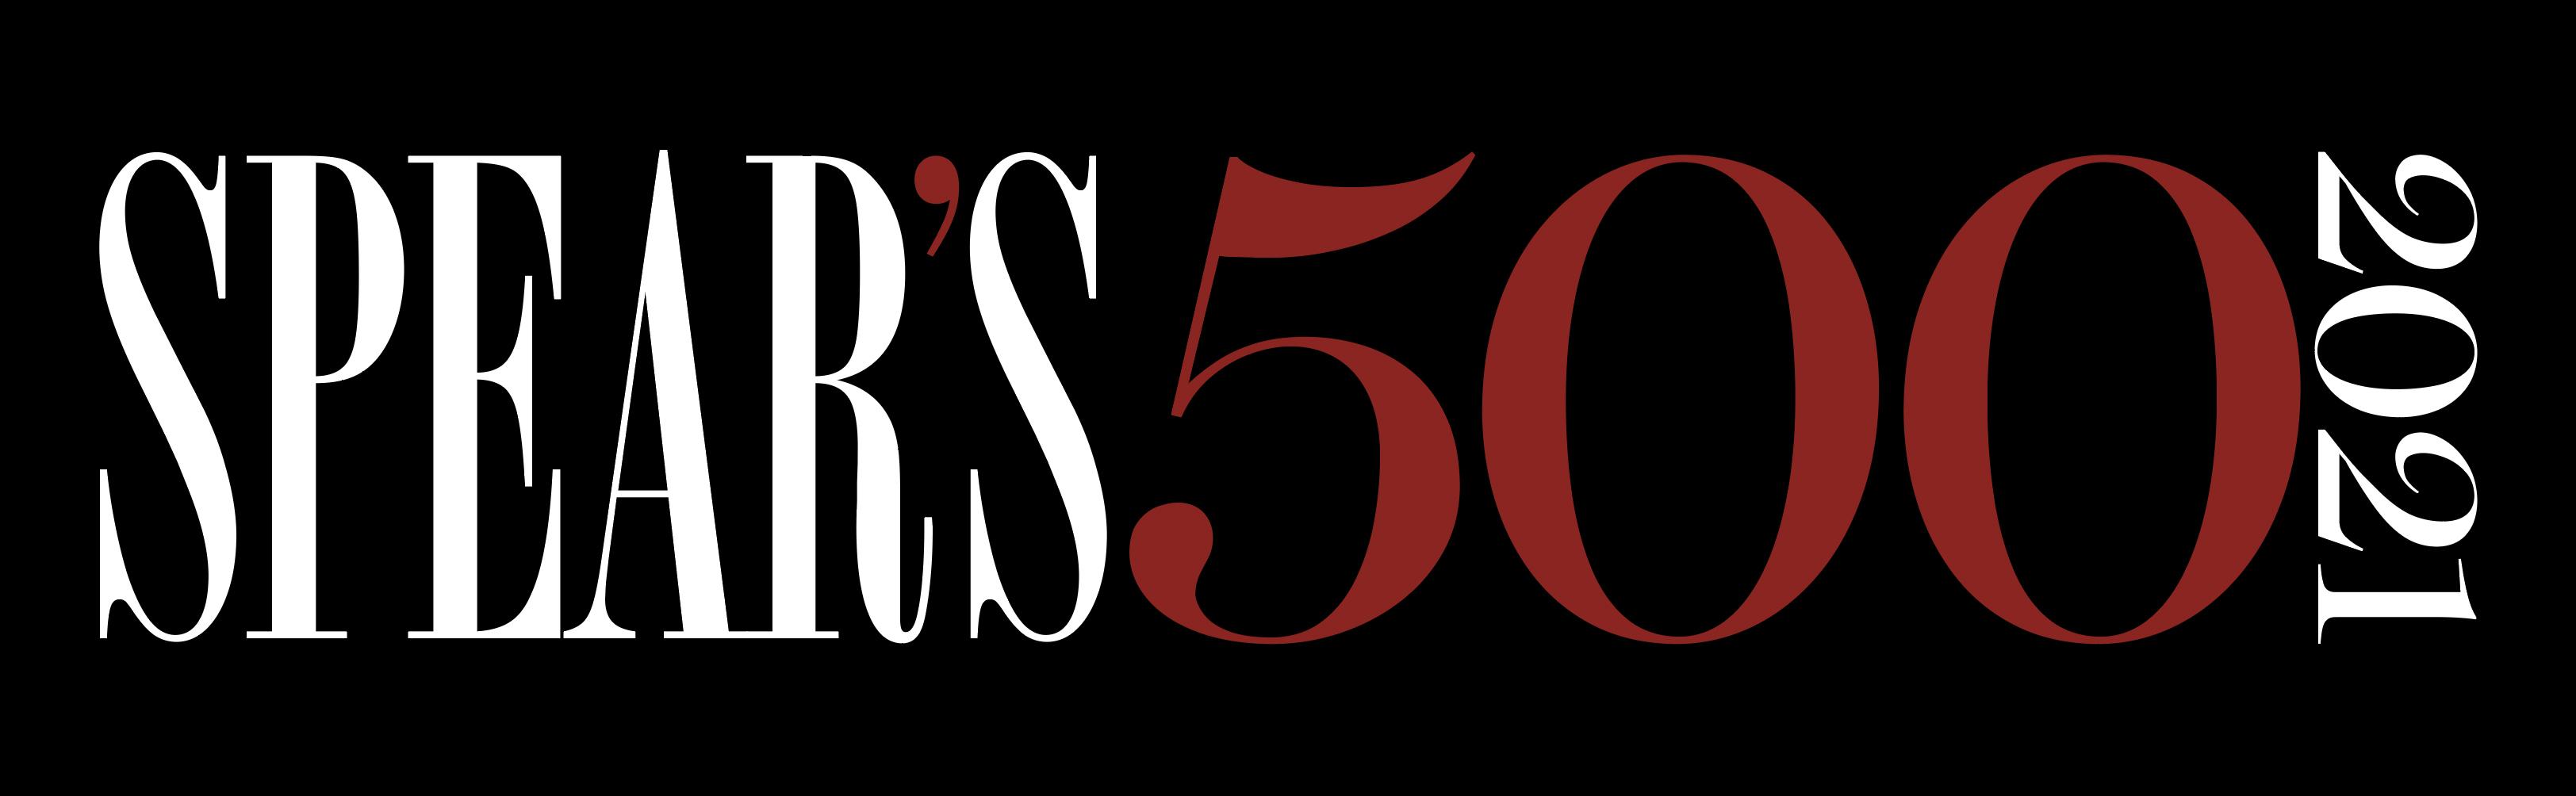 Spears-500-2021-Digital-Icon.jpg